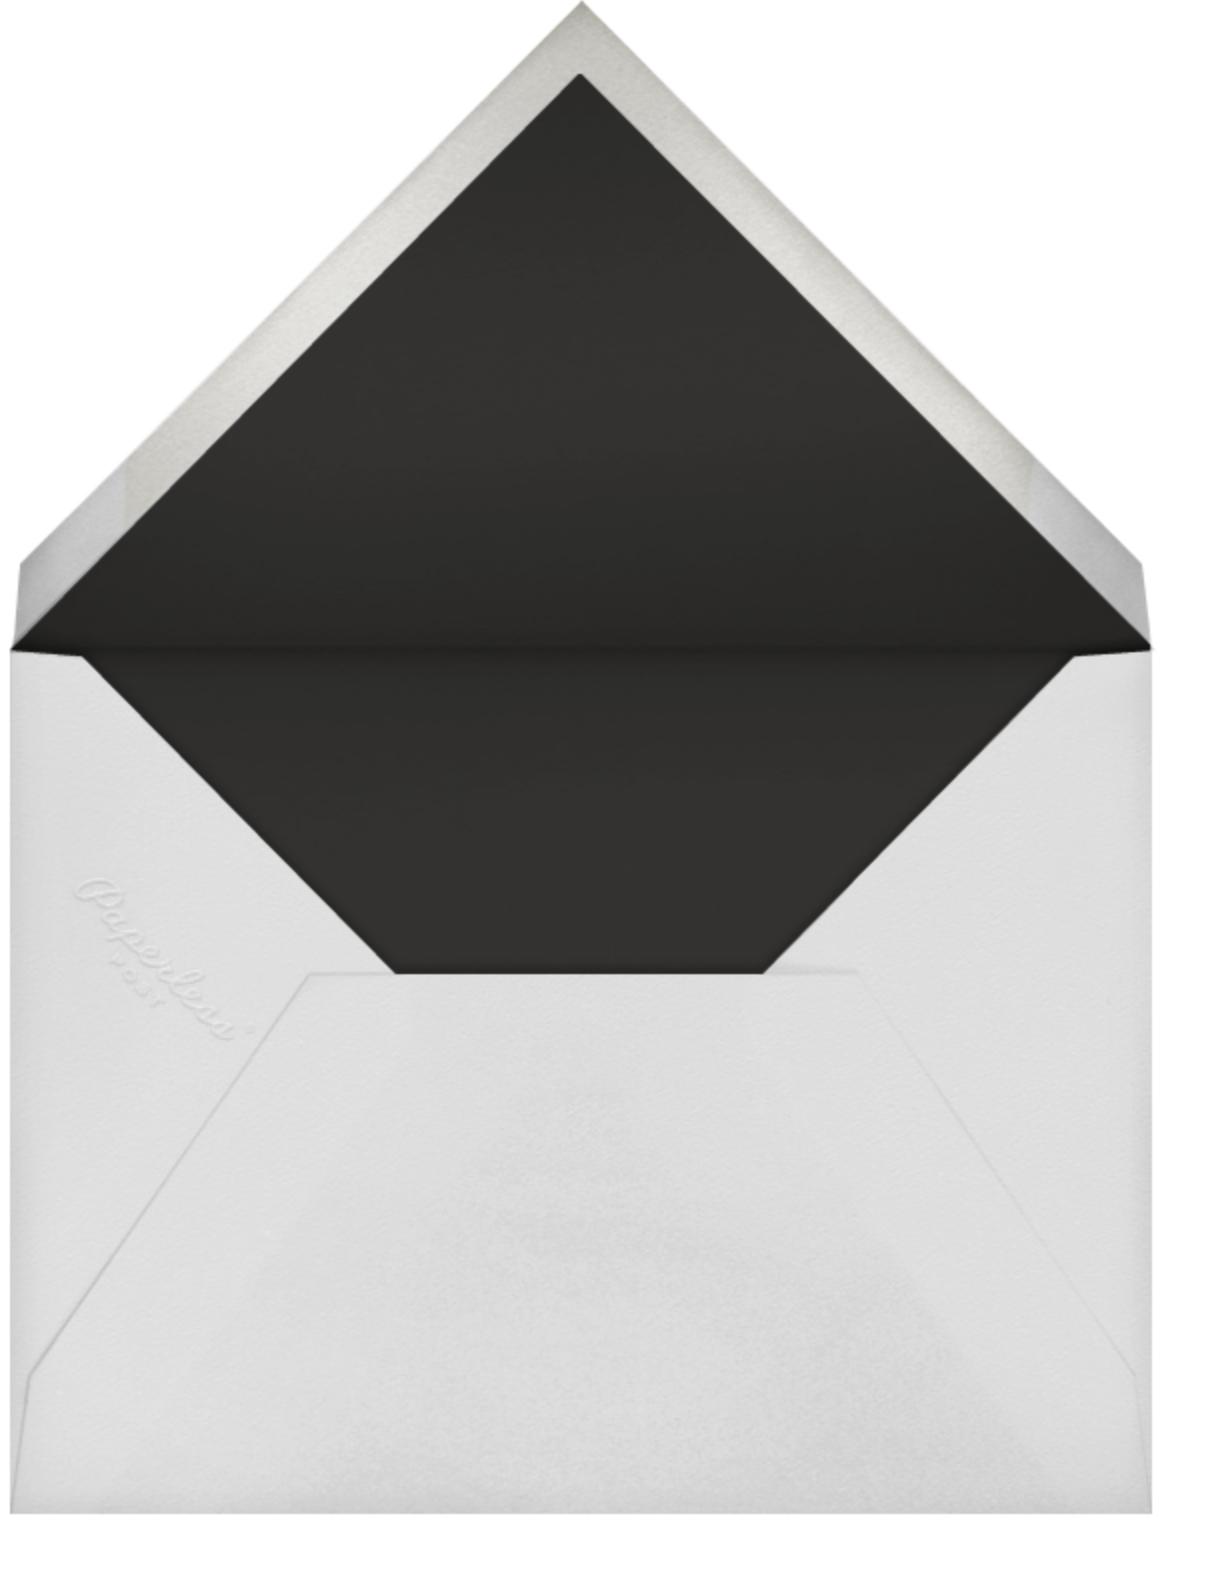 Richmond Park (Save the Date) - Navy/Rose Gold - Oscar de la Renta - Save the date - envelope back